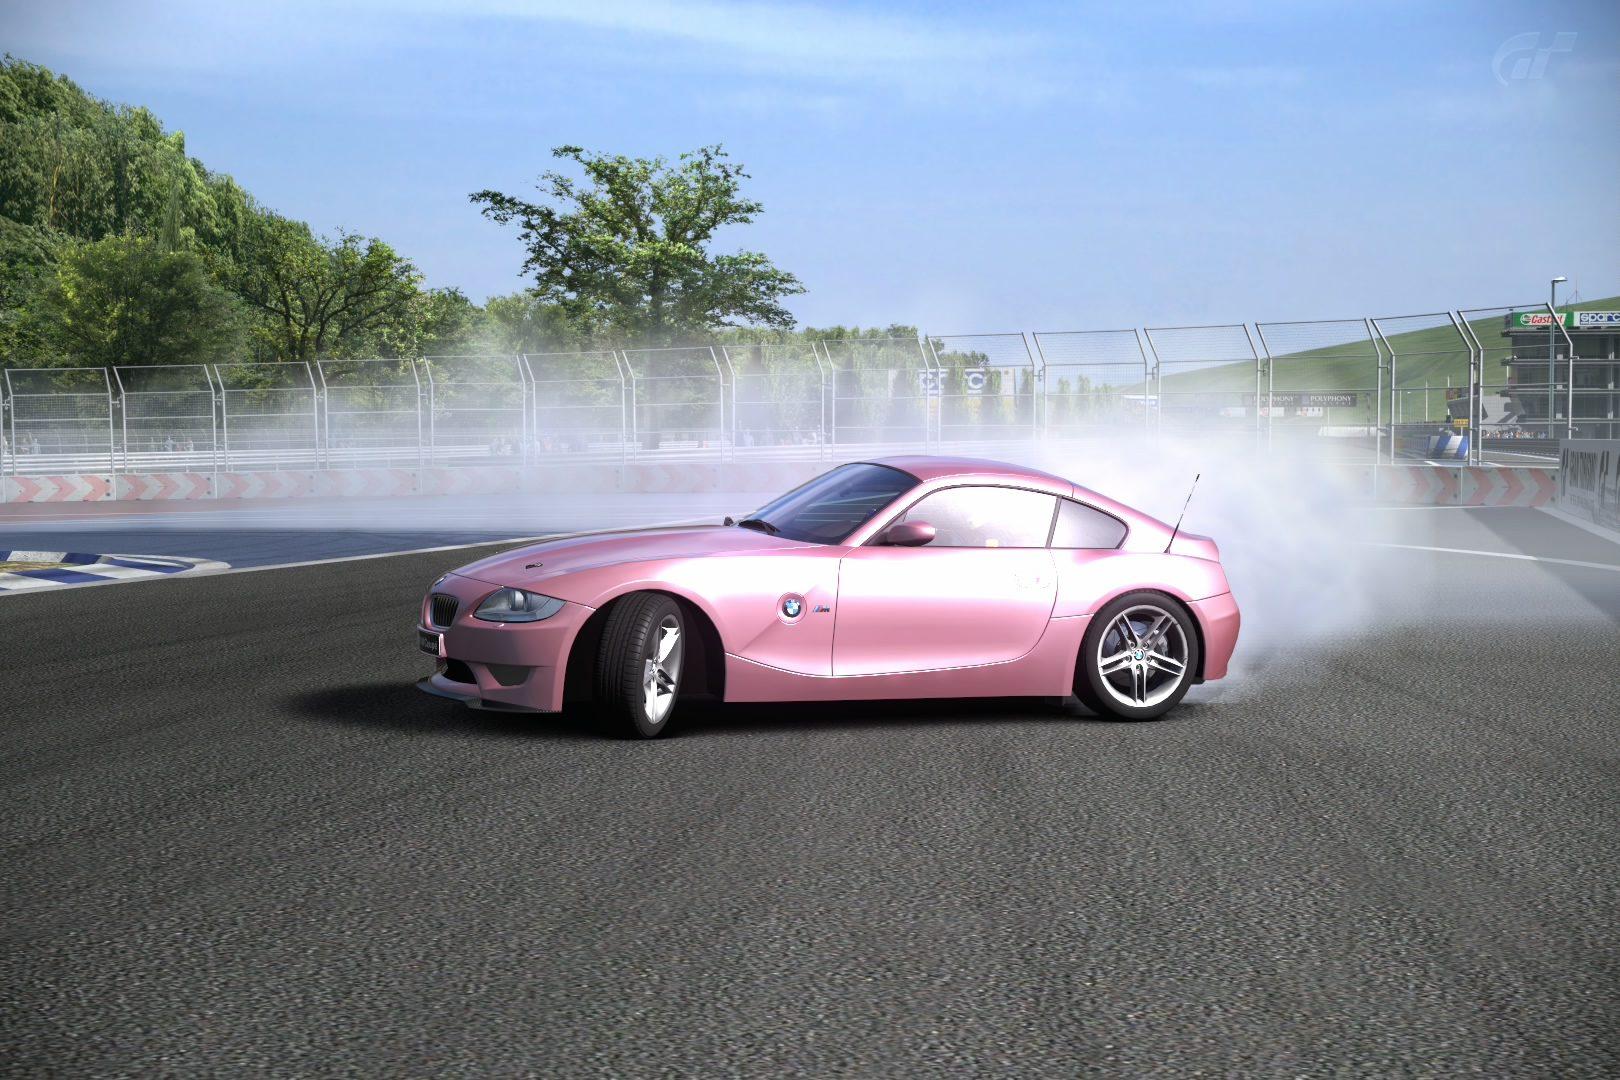 BMWPinkImg3.jpg